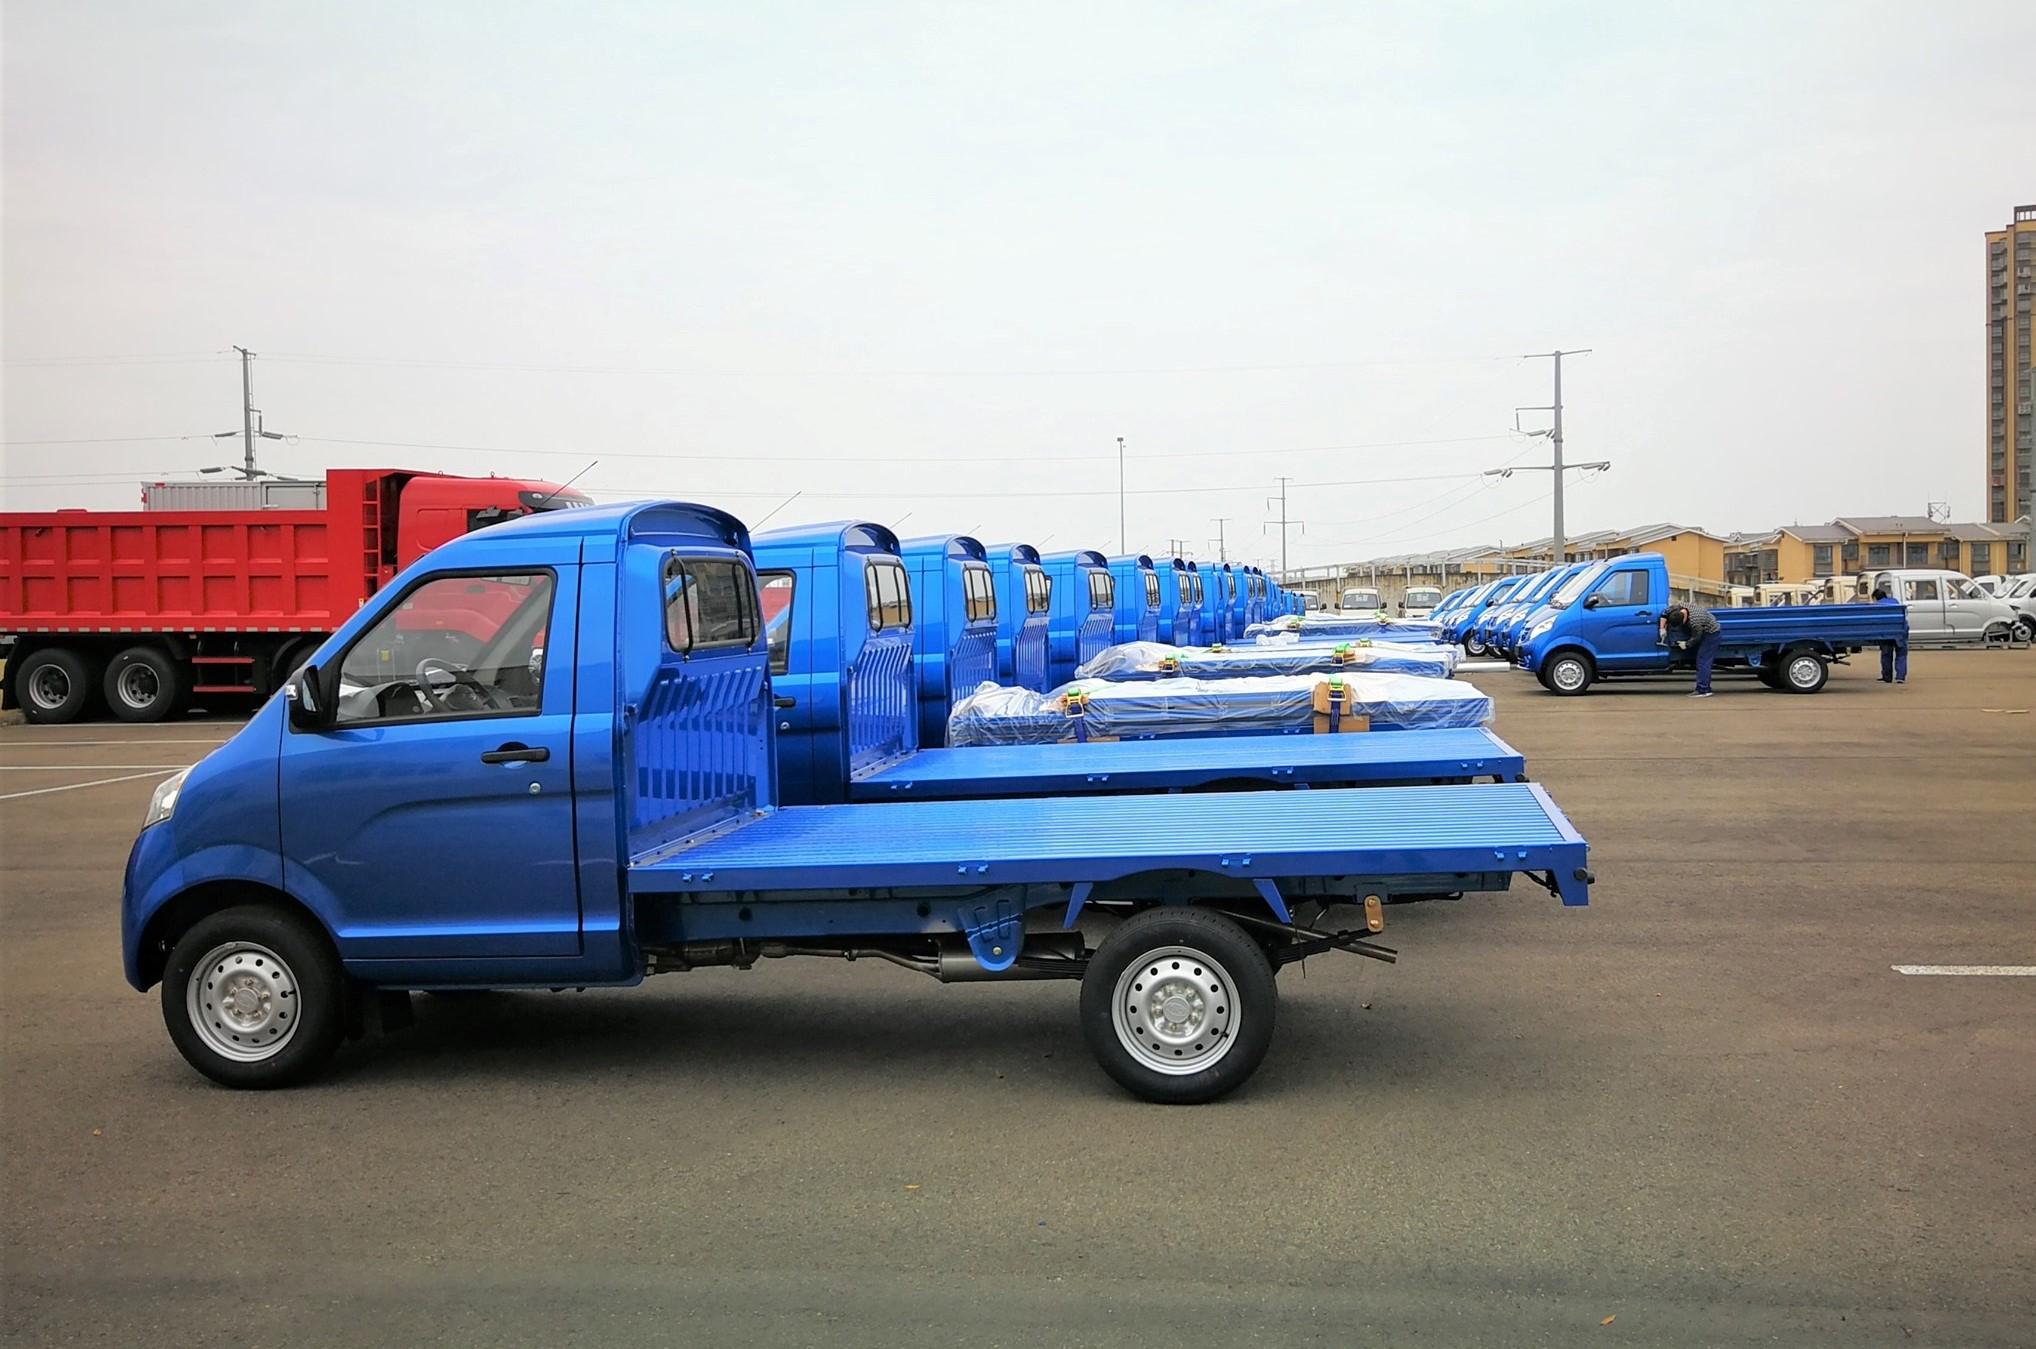 50-mini-trucks-delivery-to-South-America-7-3-2020-4